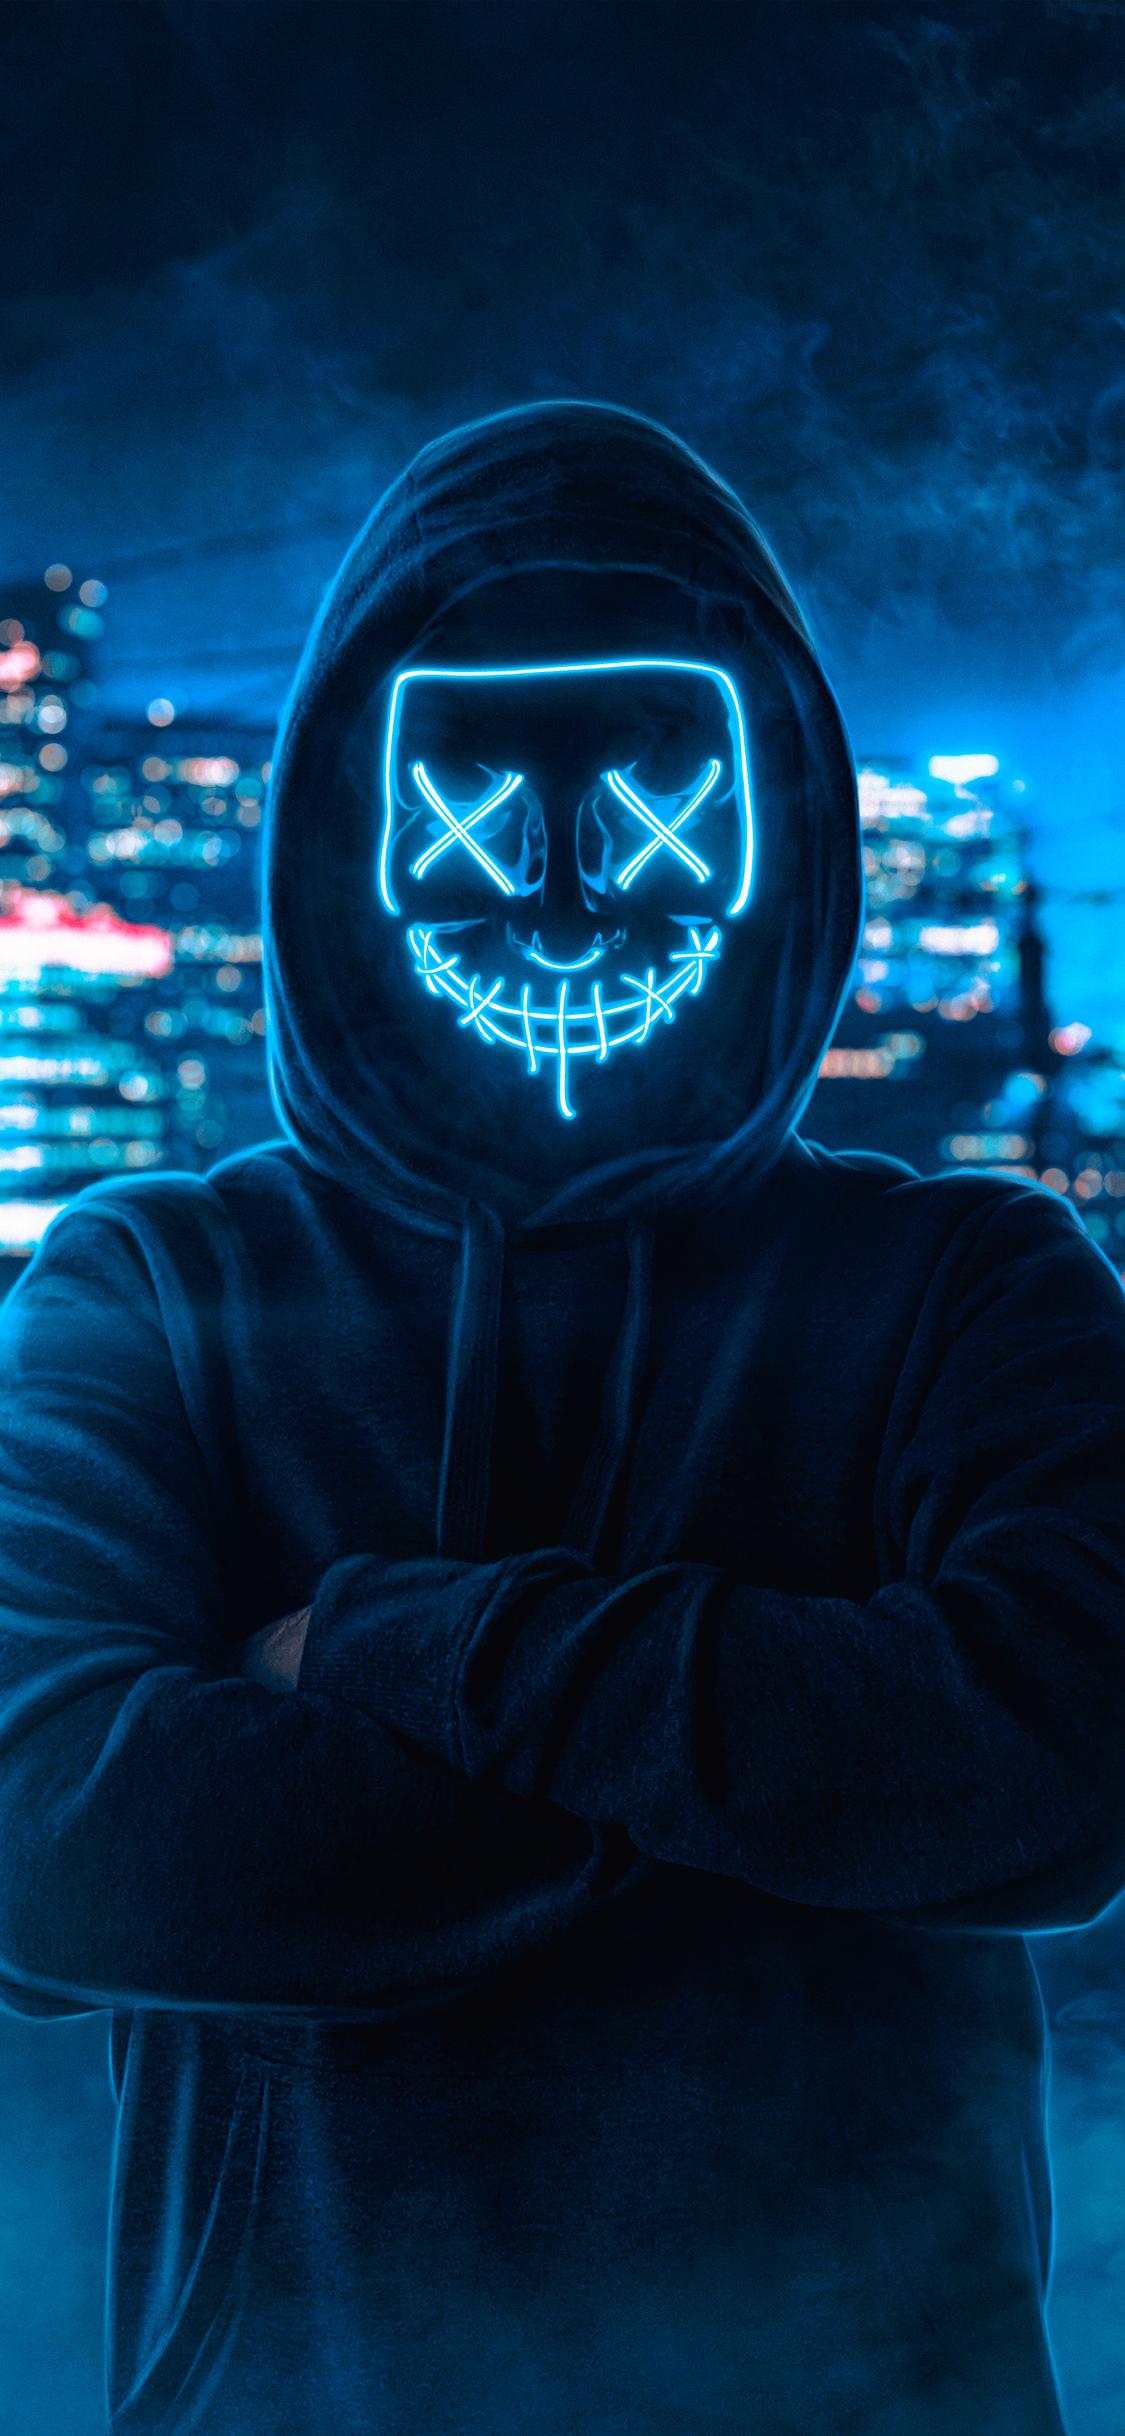 1125x2436 Hoodie Guy Mask Man Iphone Xs Iphone 10 Iphone X Hd 4k